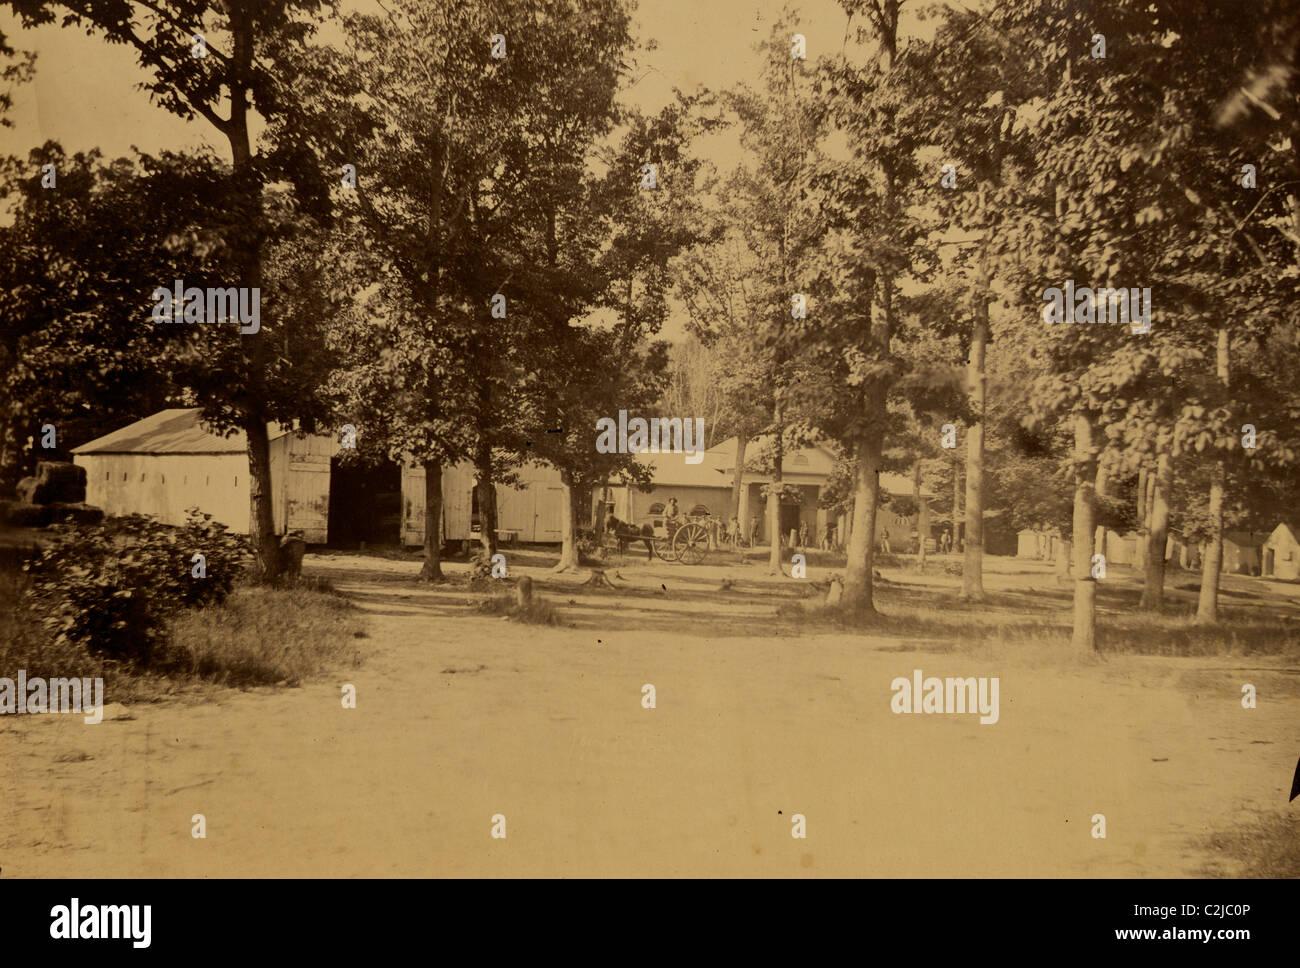 Swingers in mcclure pennsylvania